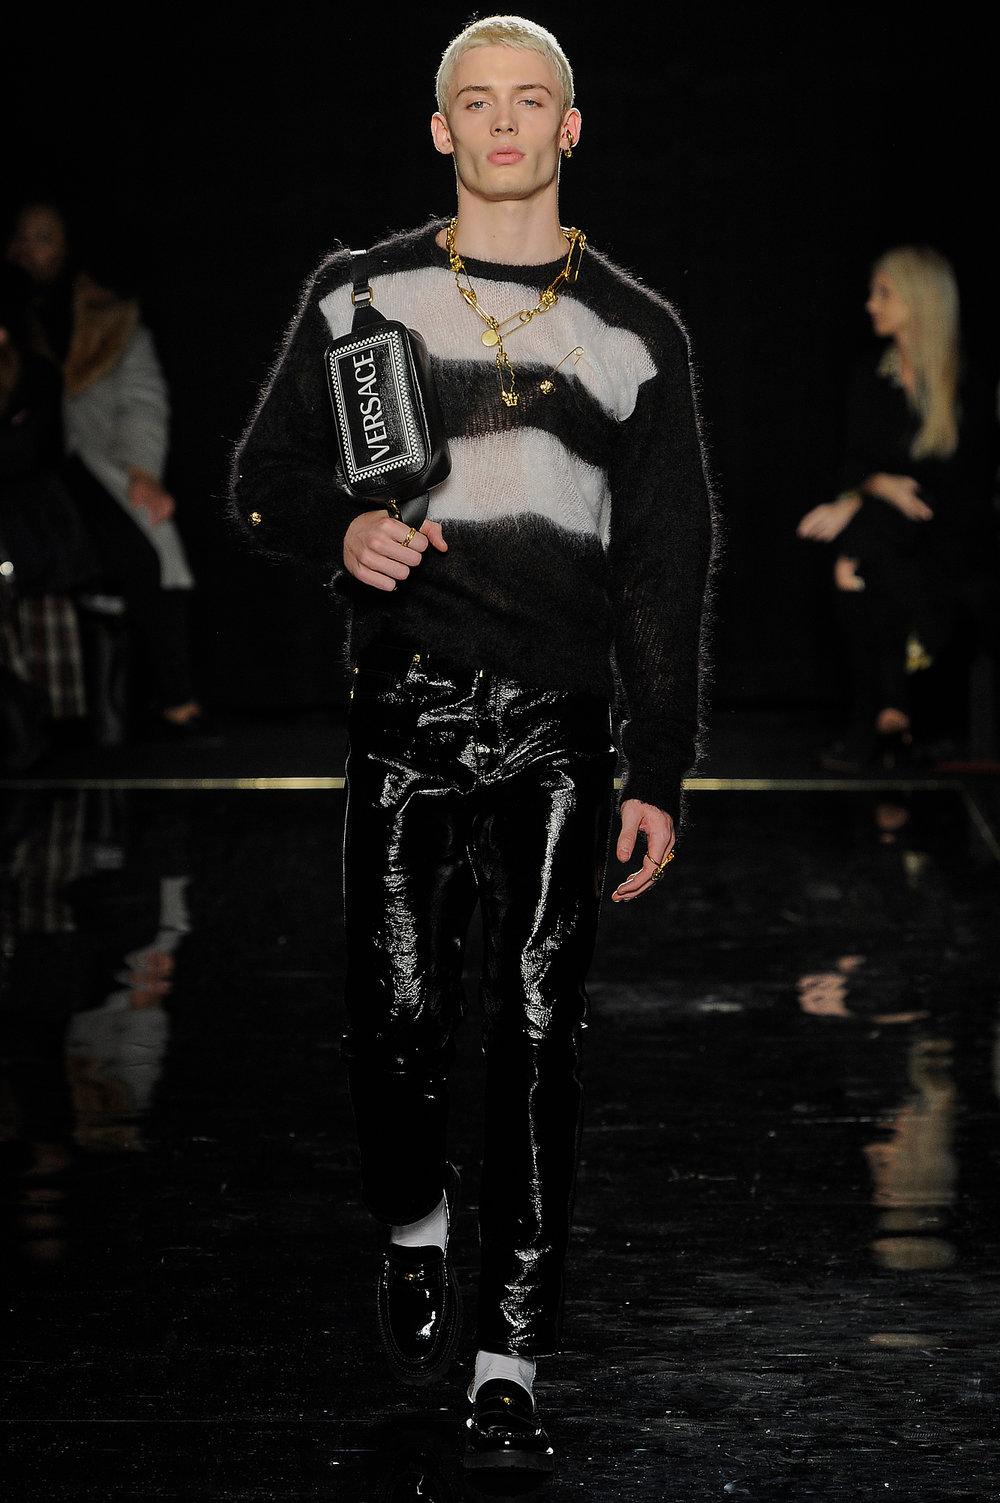 Versace_21_c8_versace_runway_runway_00021.jpg